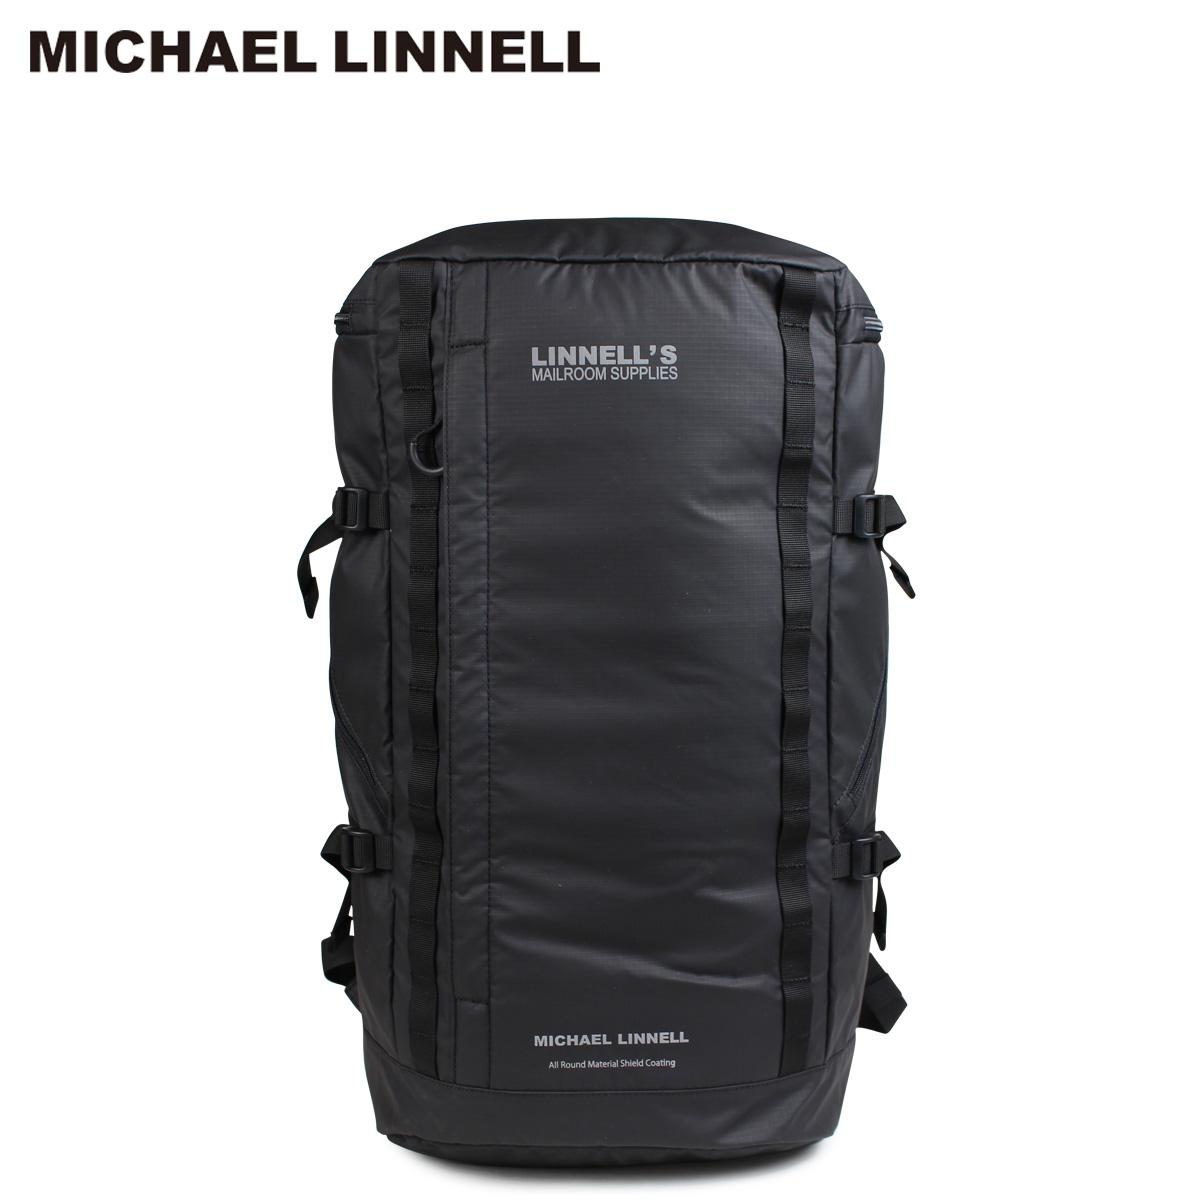 MICHAEL LINNELL BACKPACK マイケルリンネル リュック バッグ メンズ レディース バックパック ブラック MLAC-03 [10/22 新入荷]